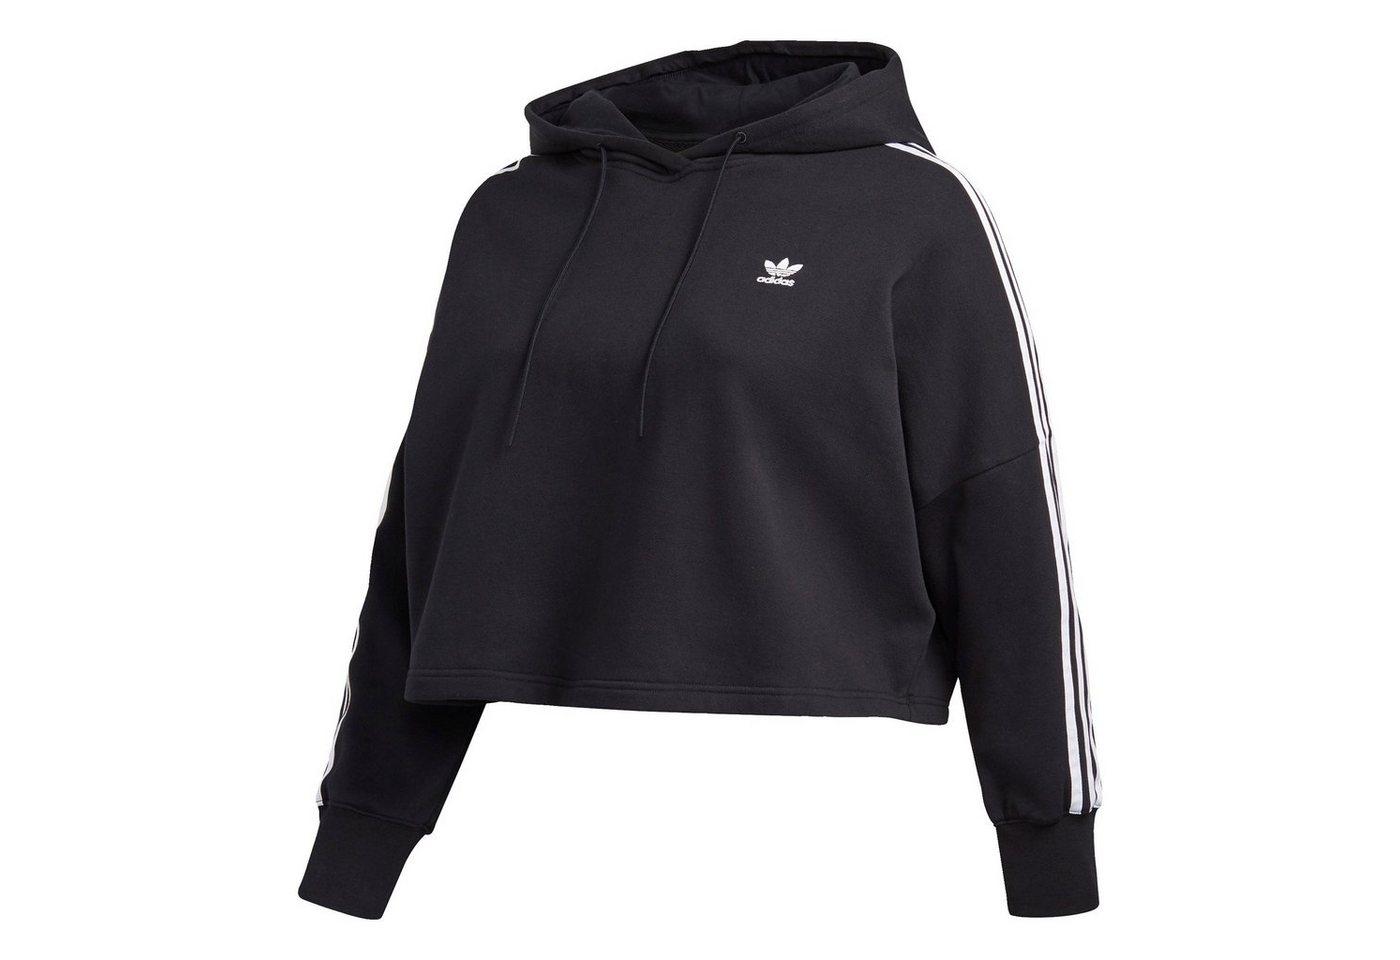 adidas originals -  Trainingspullover »Cropped Hoodie – Große Größen«